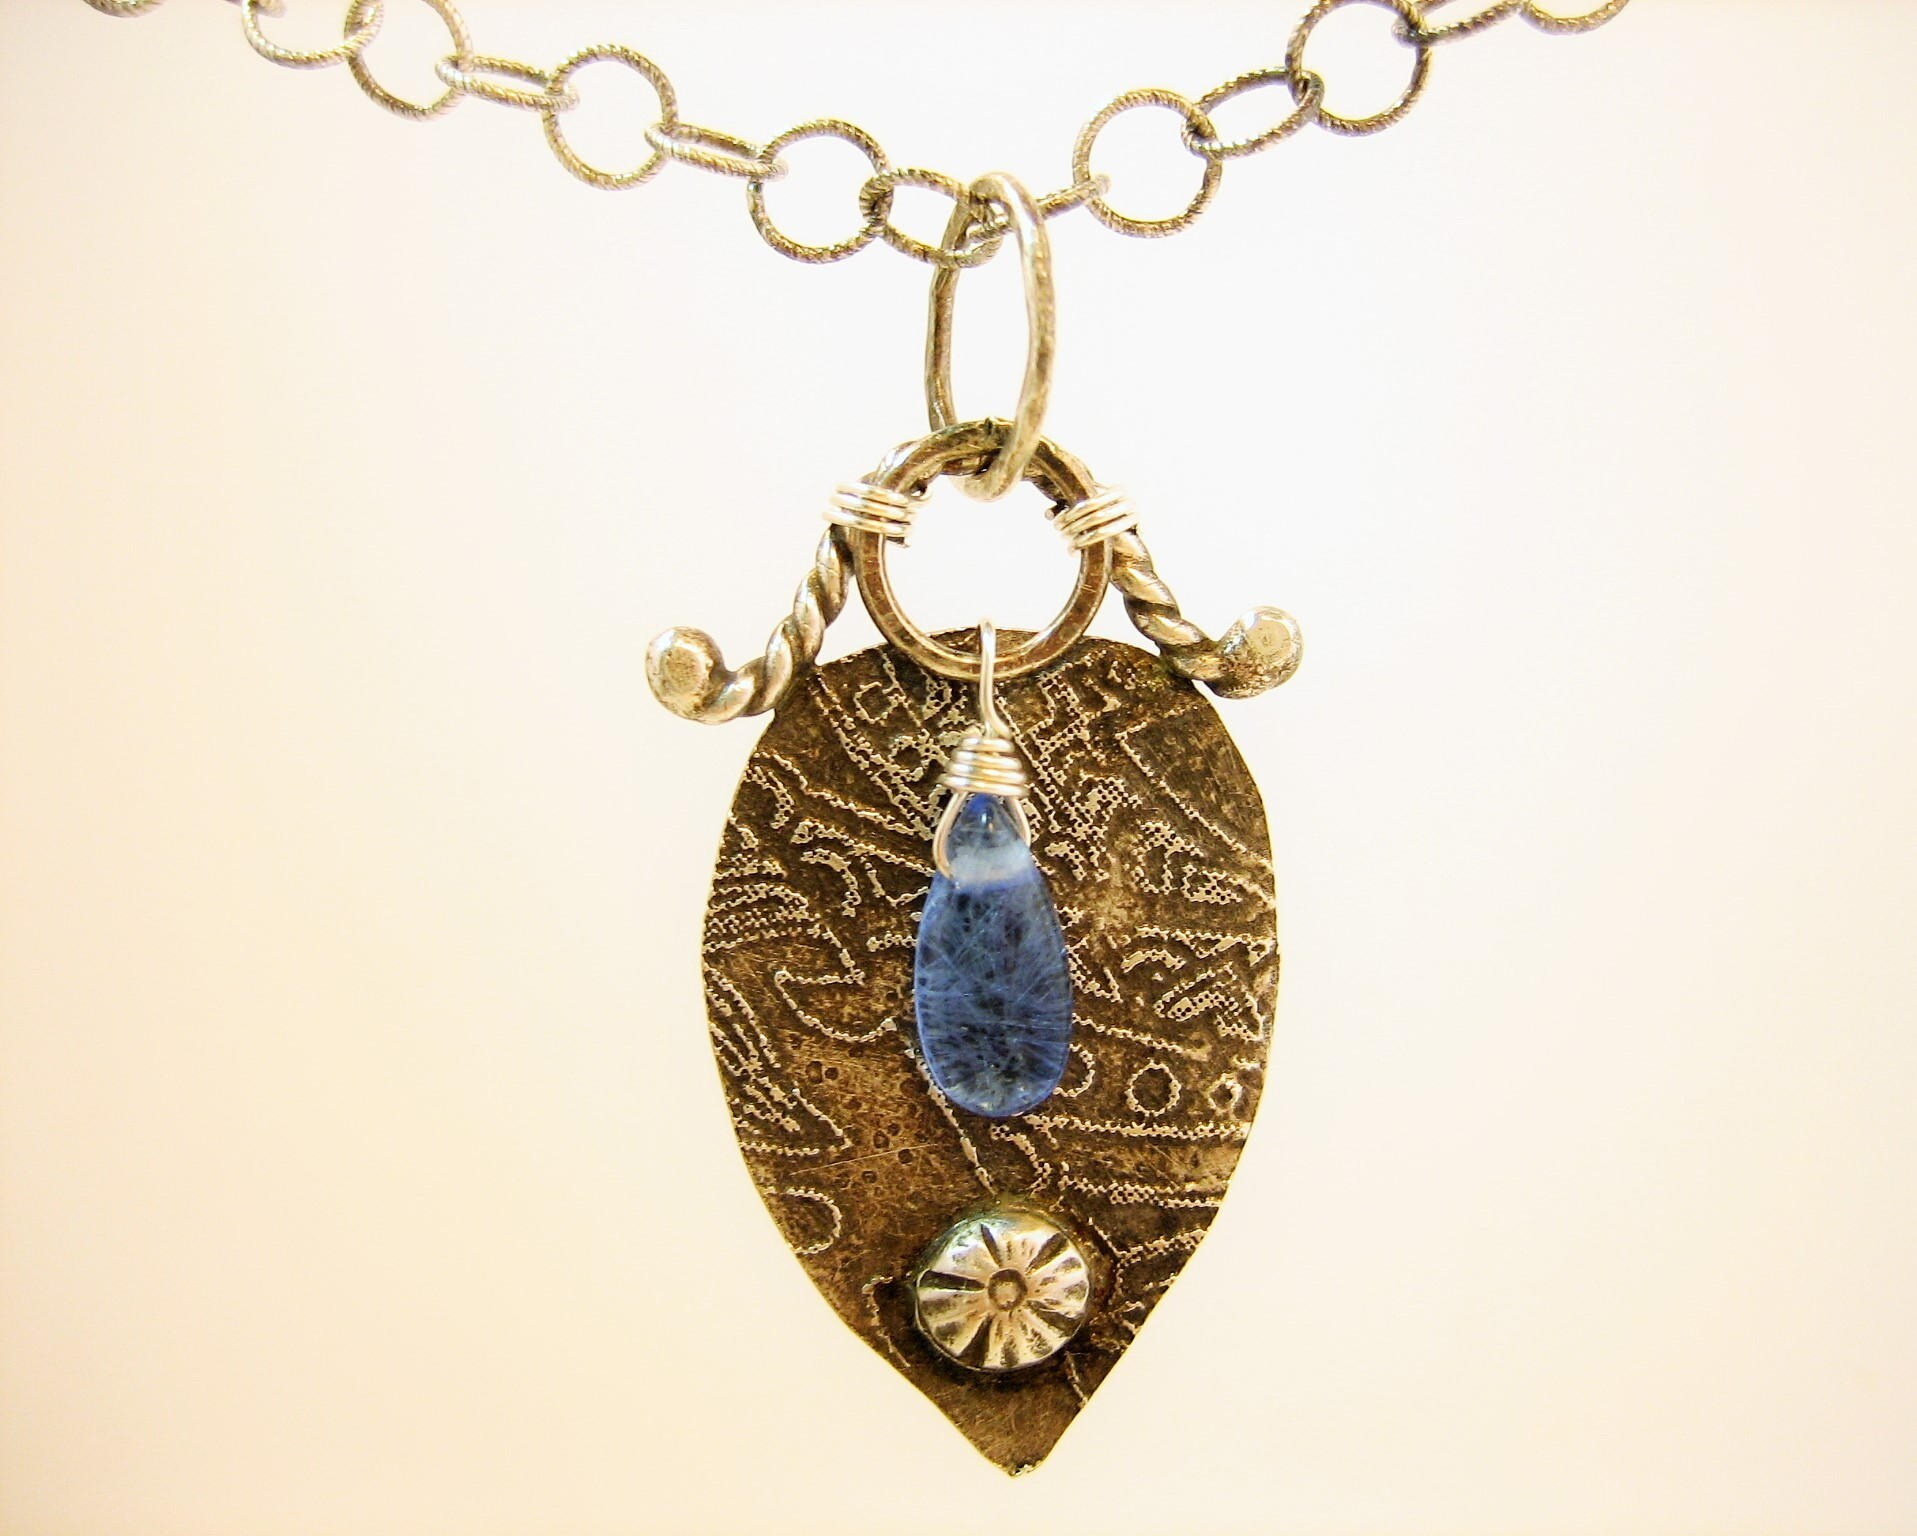 Blue quartz and oxidized silver lace patterned pendant, Artisan made etched pendant, black and blue gemstone necklace, drop pendant necklace